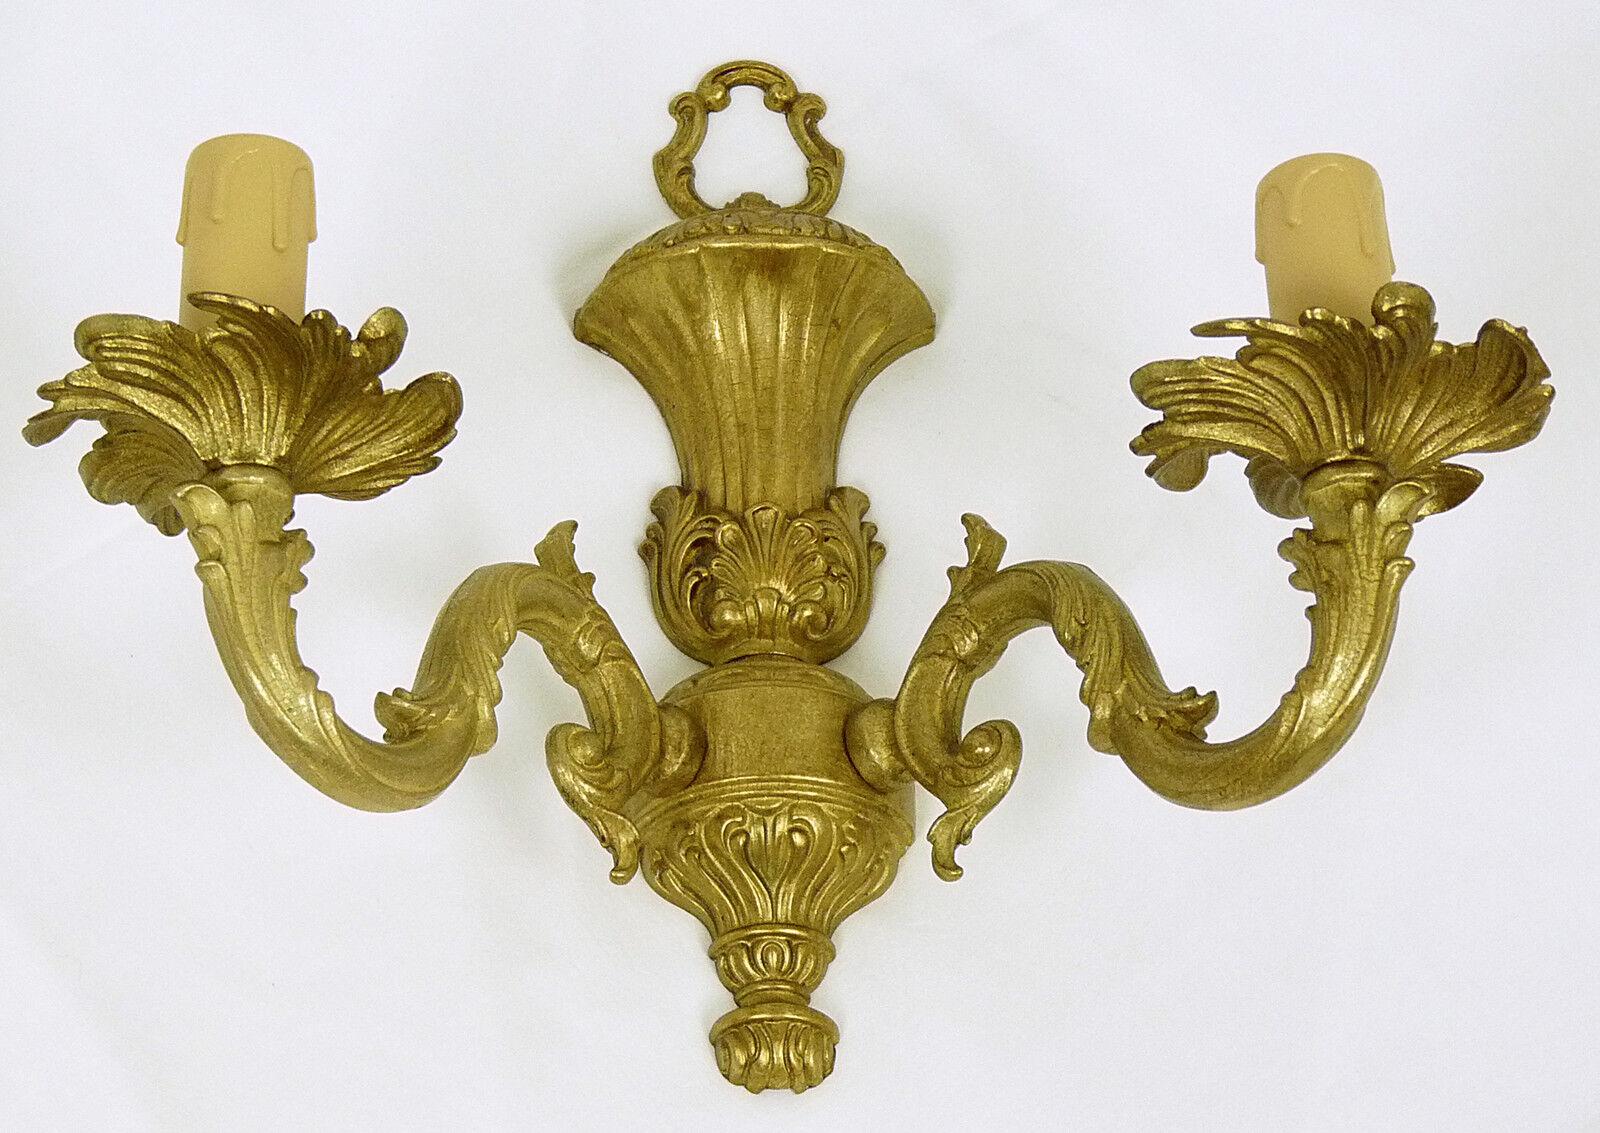 Appliques lampada led da parete in ottone alta alta alta qualita